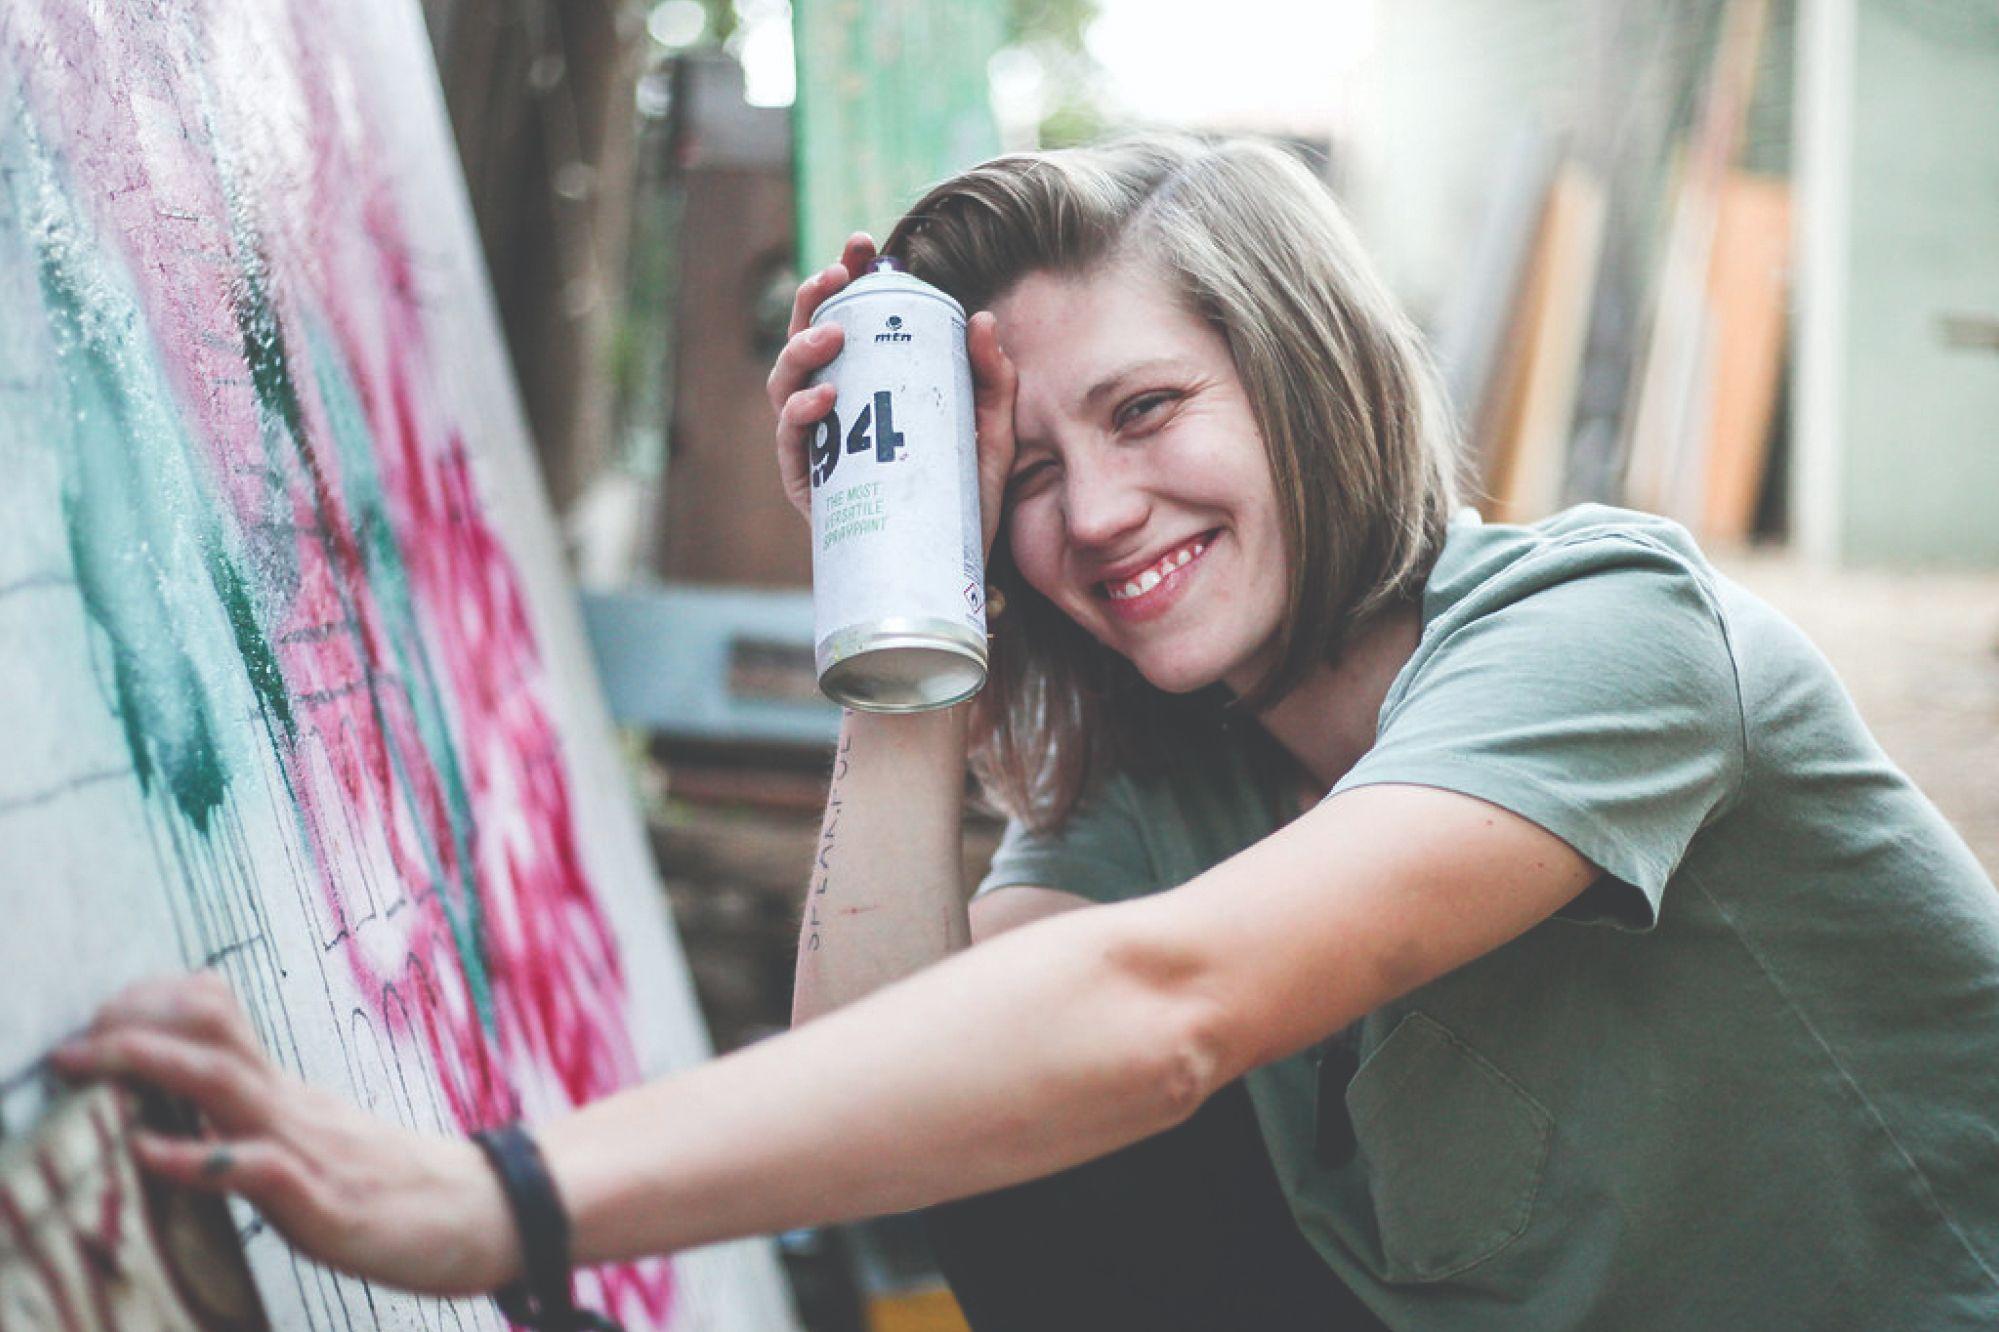 Grace Loescher creates artwork with spray paint on a wall in Sacramento.